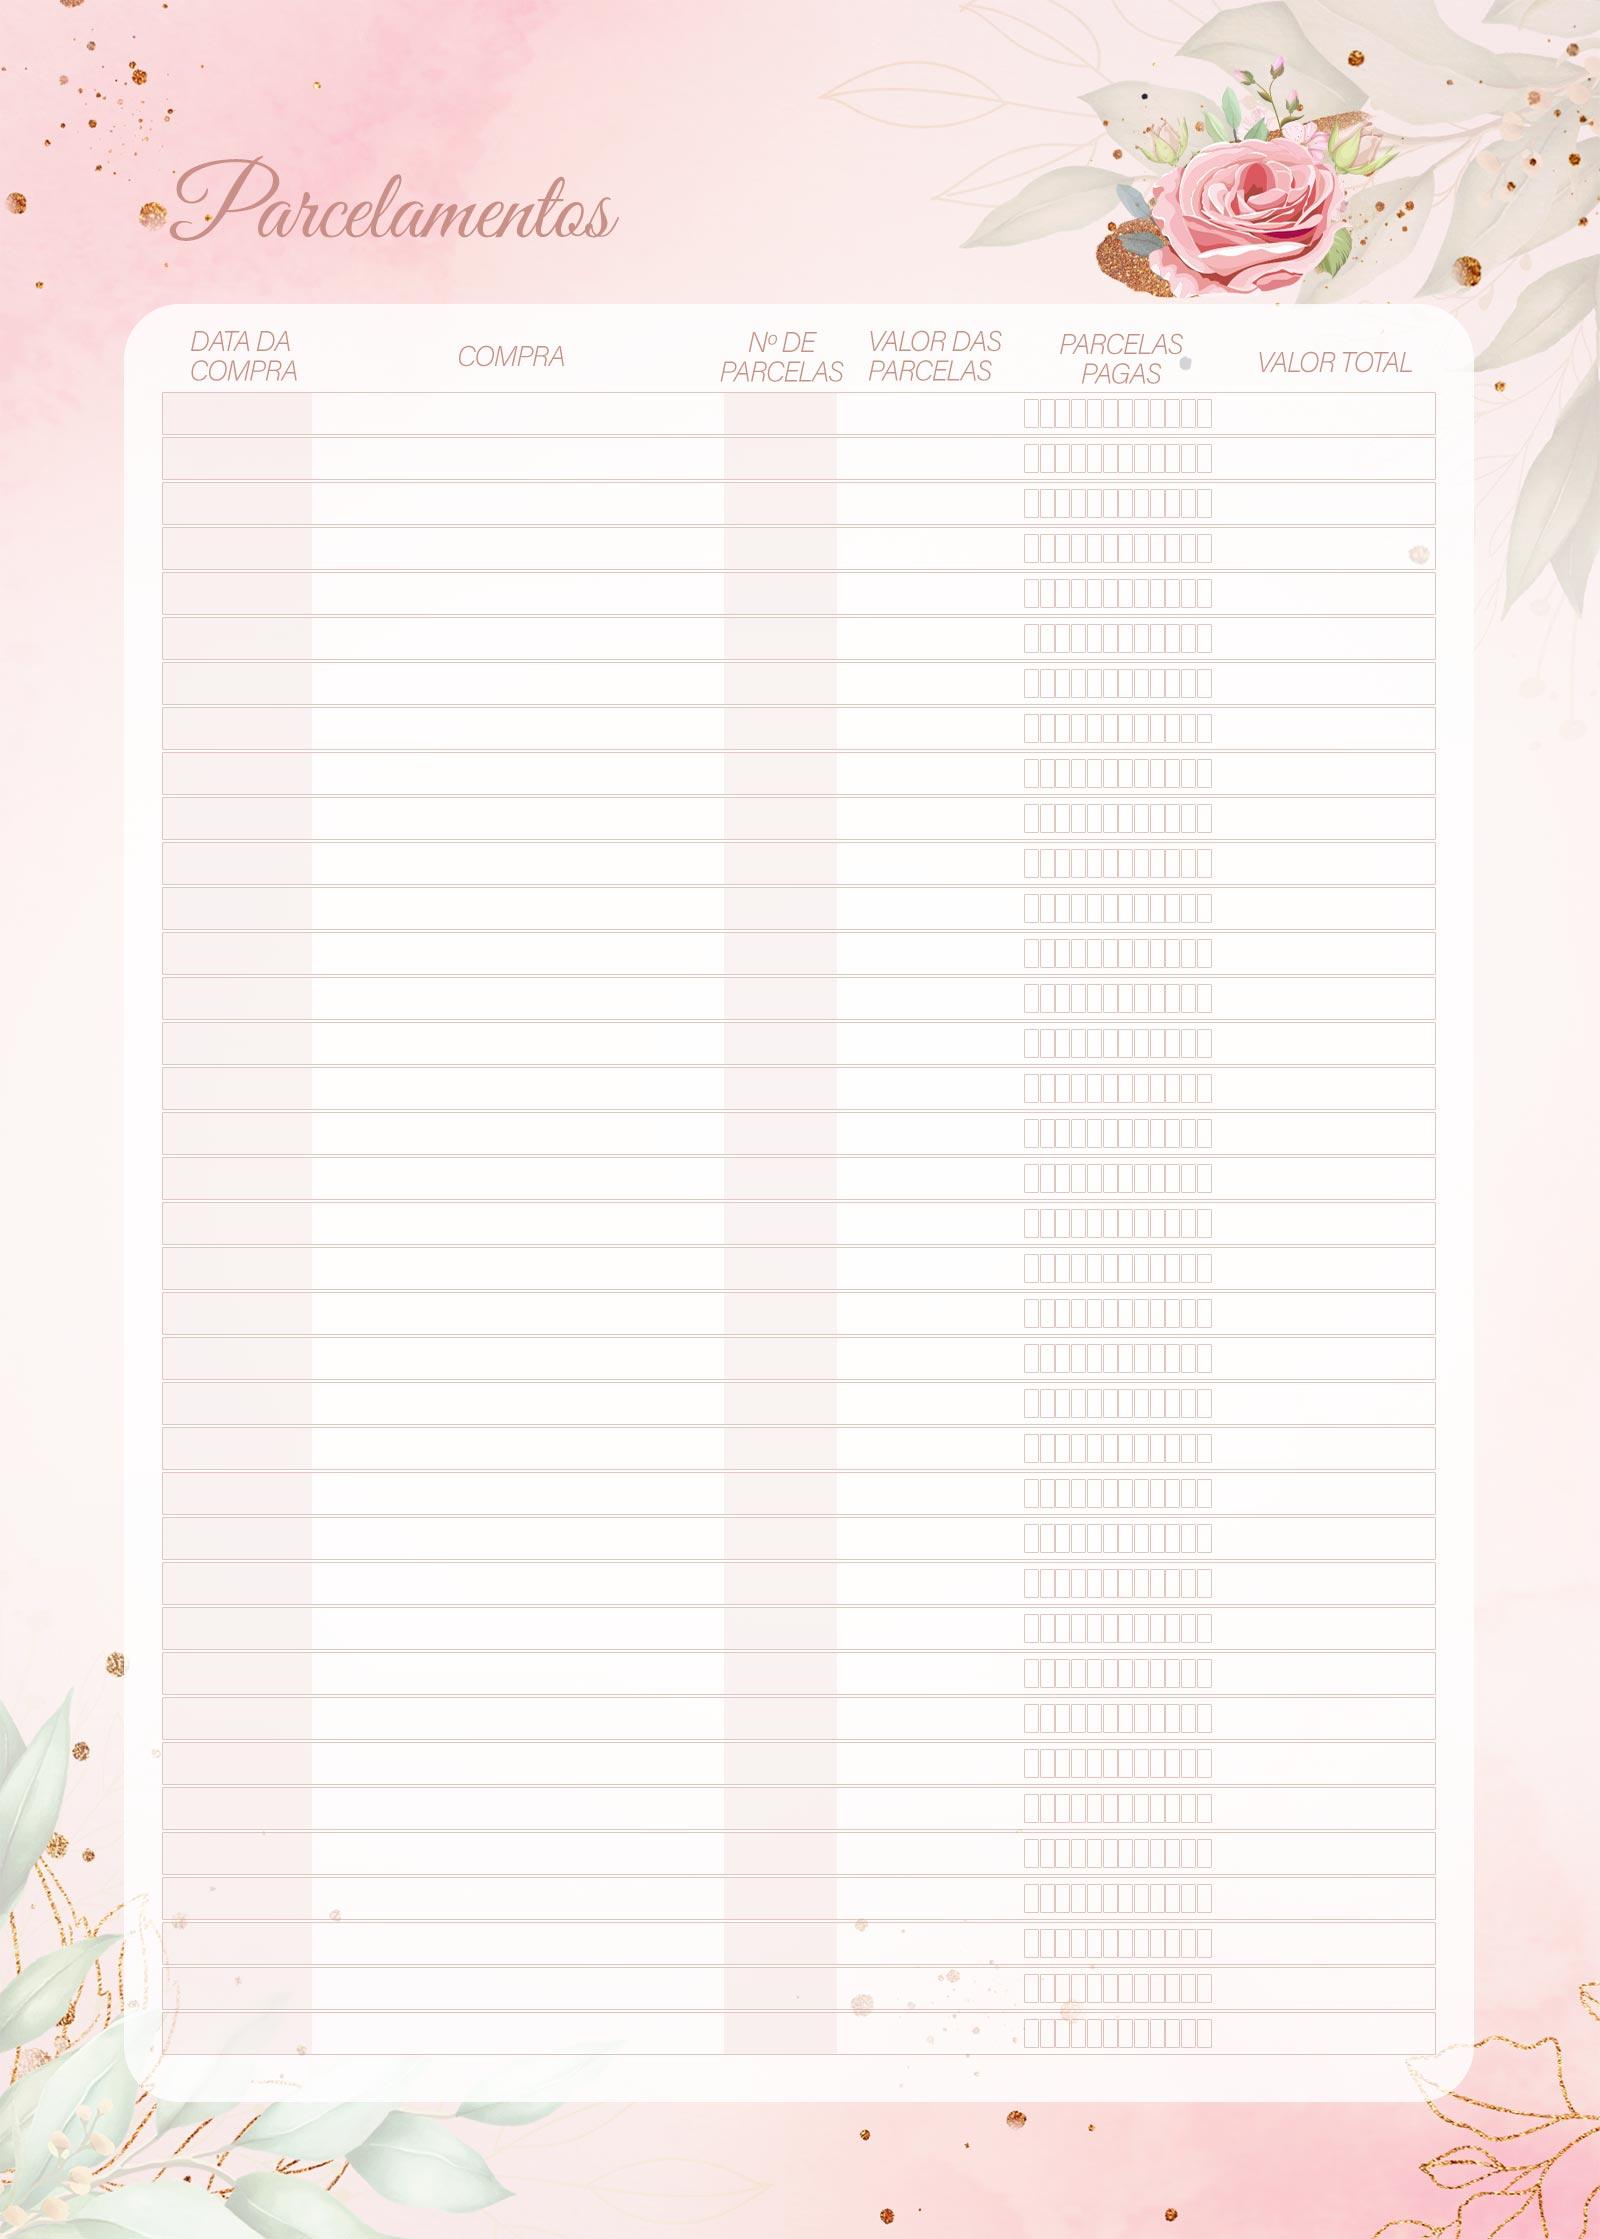 Planner 2021 Floral com Inicial Parcelamentos